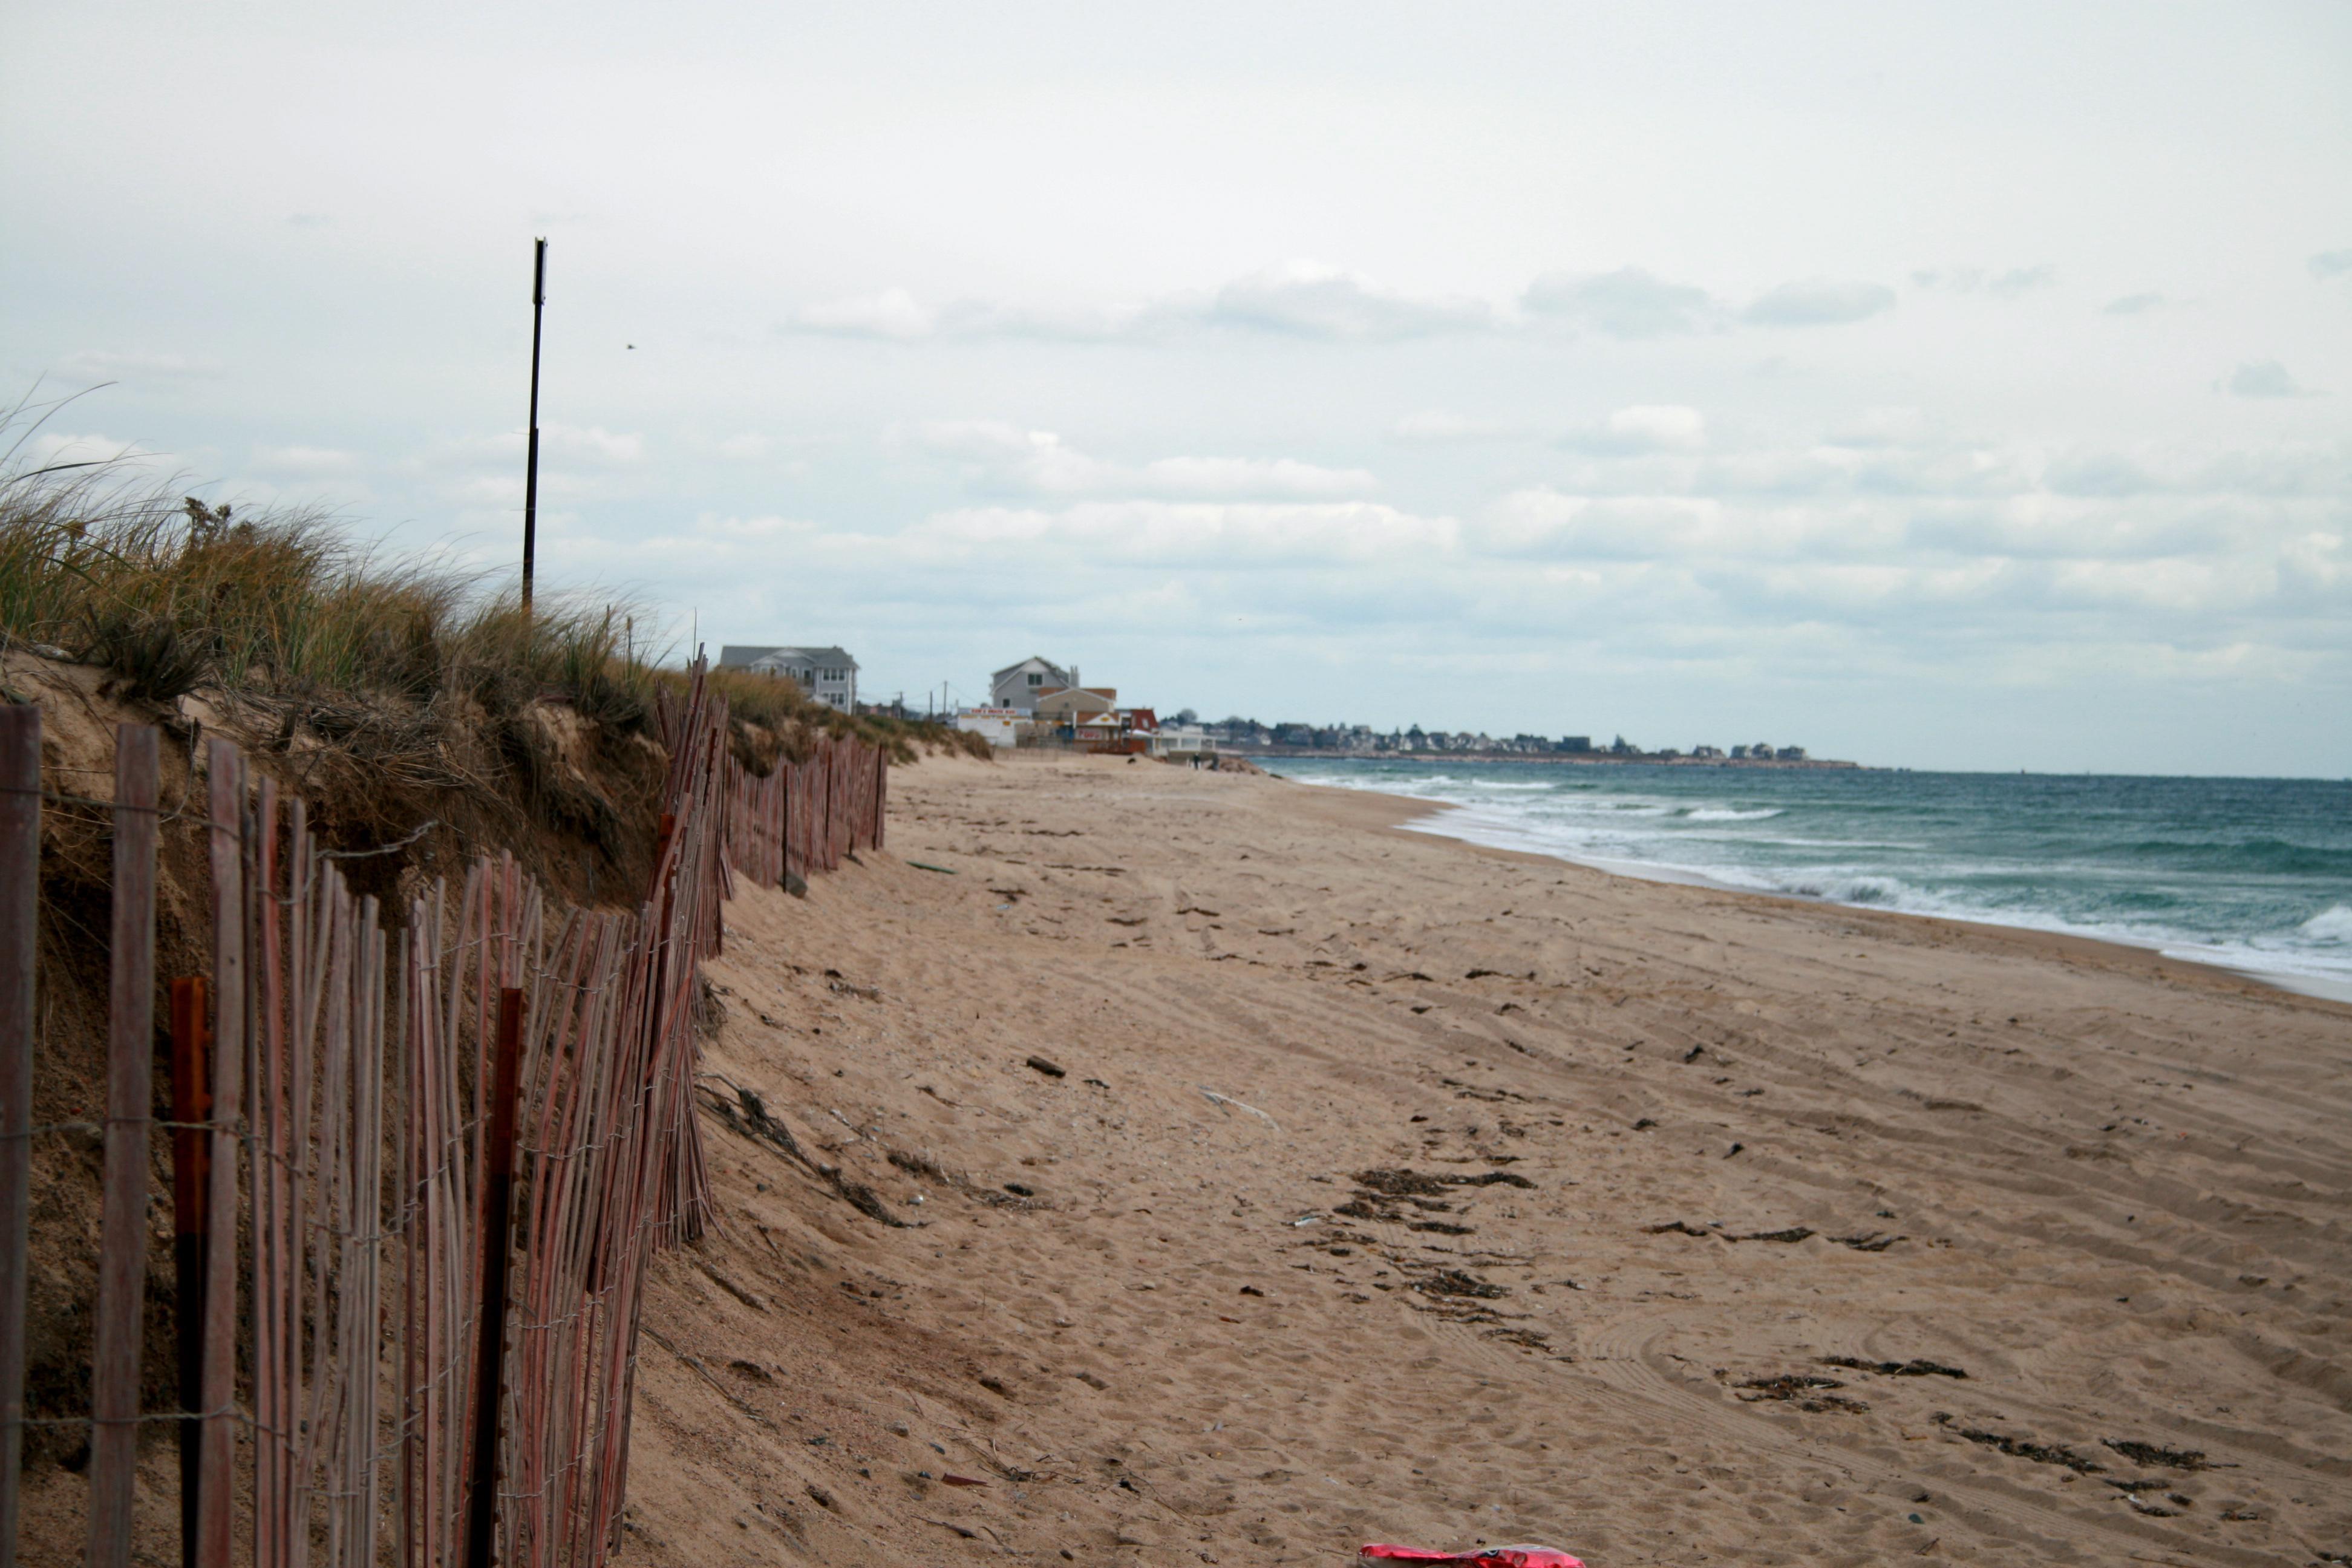 Fence Misquamicut Beach Rhode Island